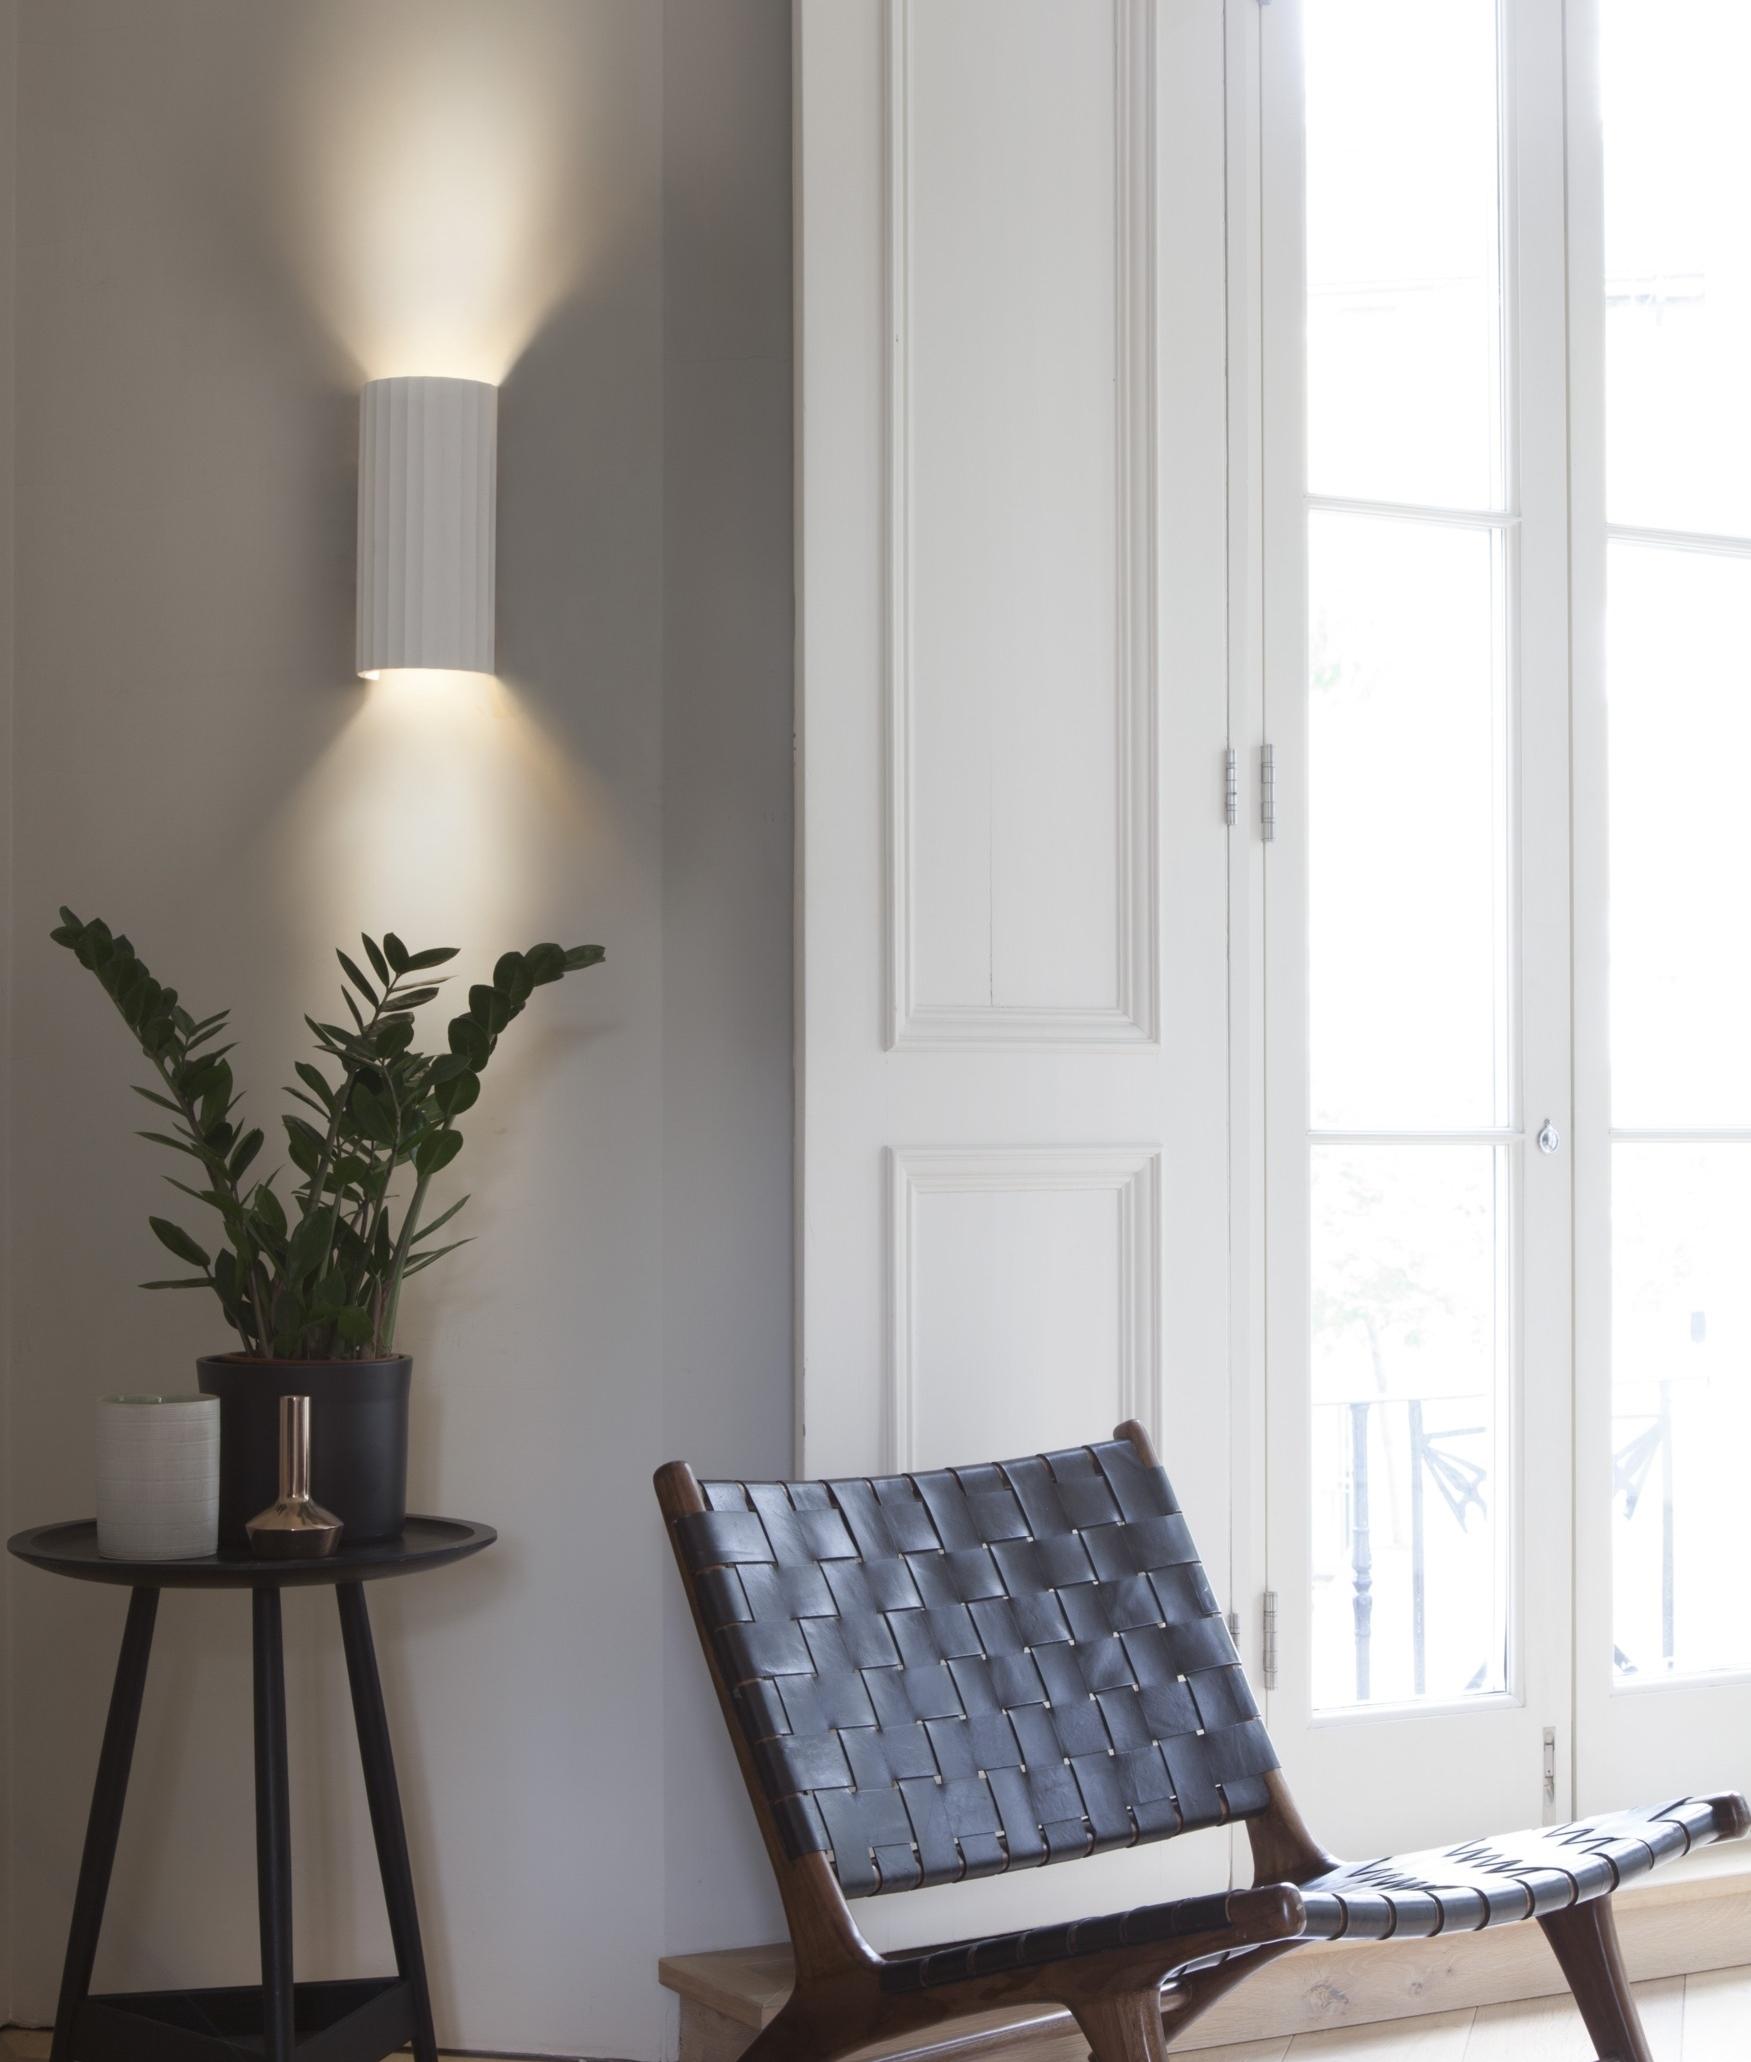 plaster rippled up down wall light. Black Bedroom Furniture Sets. Home Design Ideas